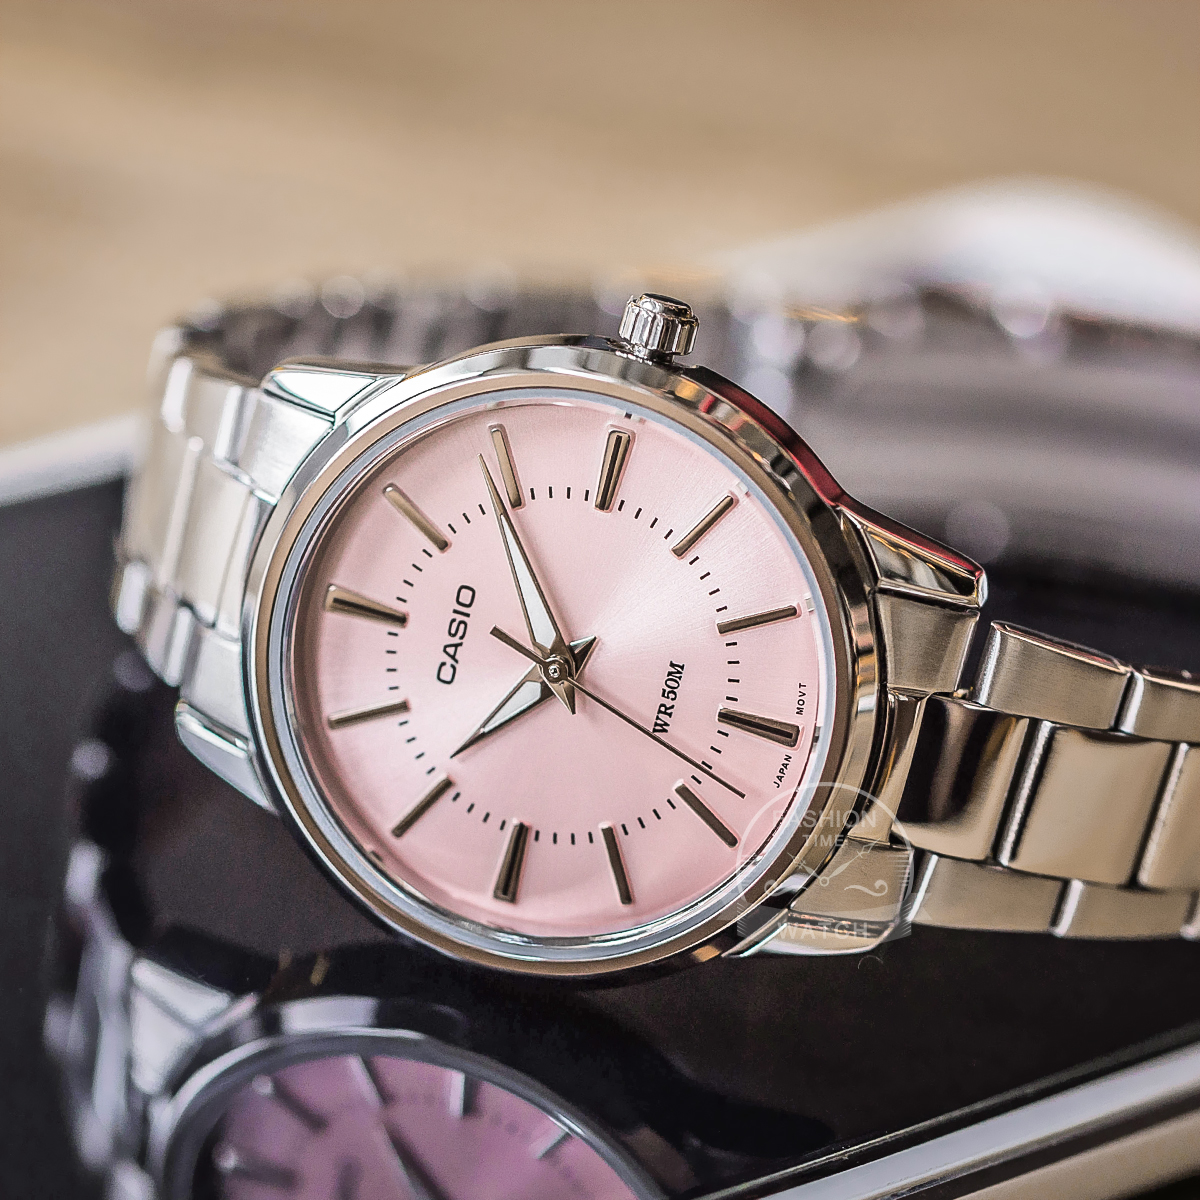 Часы Casio женские наручные часы Set top brand люкс Водонепроницаемые кварцевые наручные часы Светящиеся женские часы Спортивные часы женские relogio feminino reloj mujer montre homme bayan kol saati zegarek damski - 3